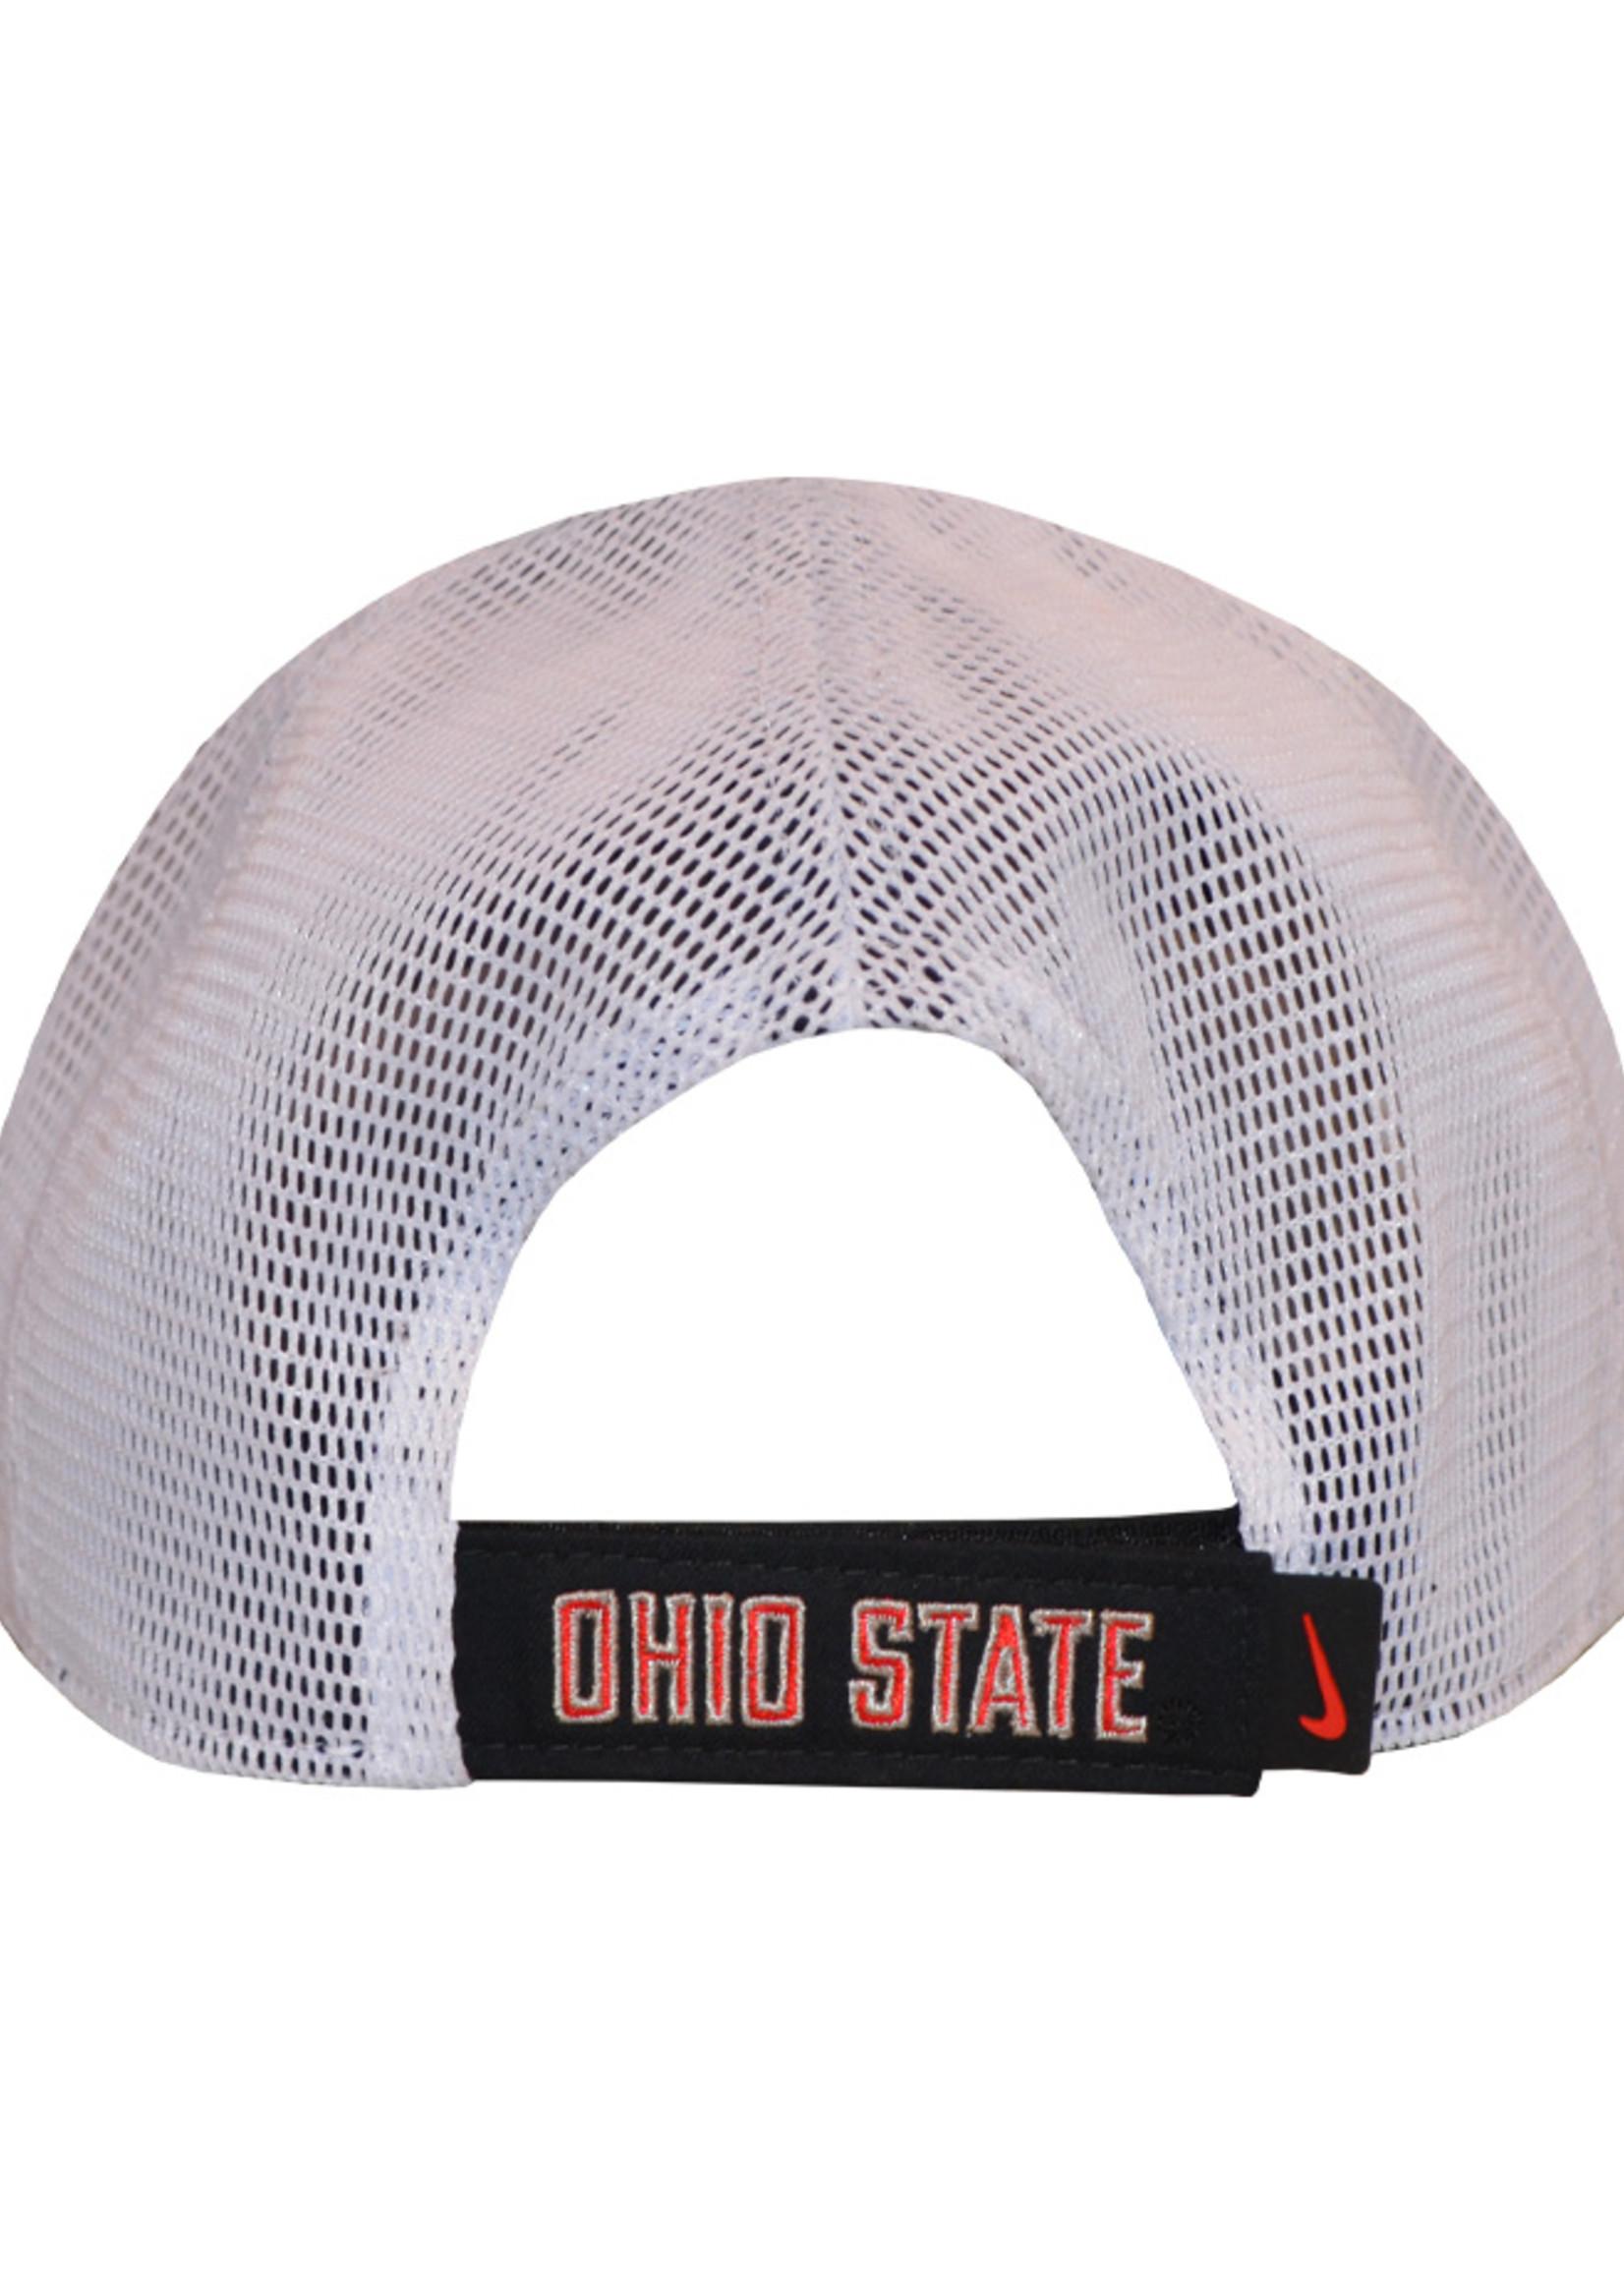 Nike Ohio State Buckeyes Nike H86 Adjustable Hat